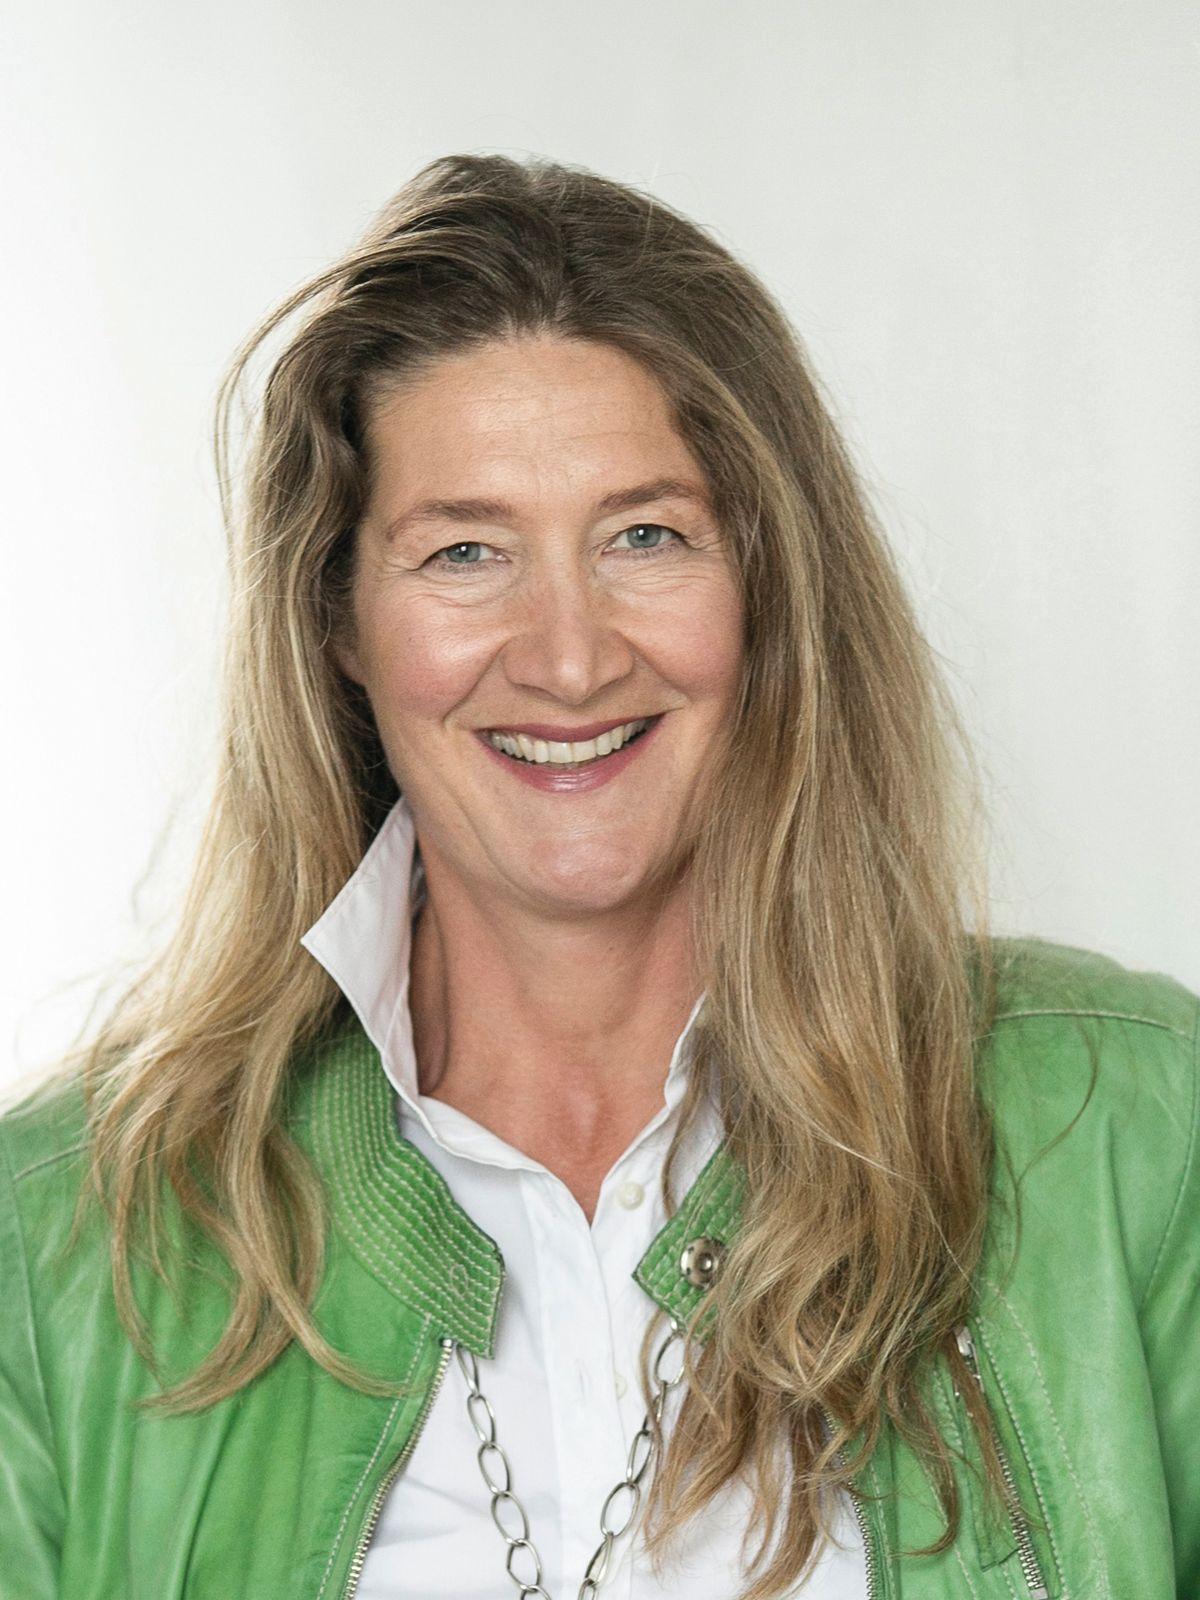 Sonja Pickhardt-Kröpfel